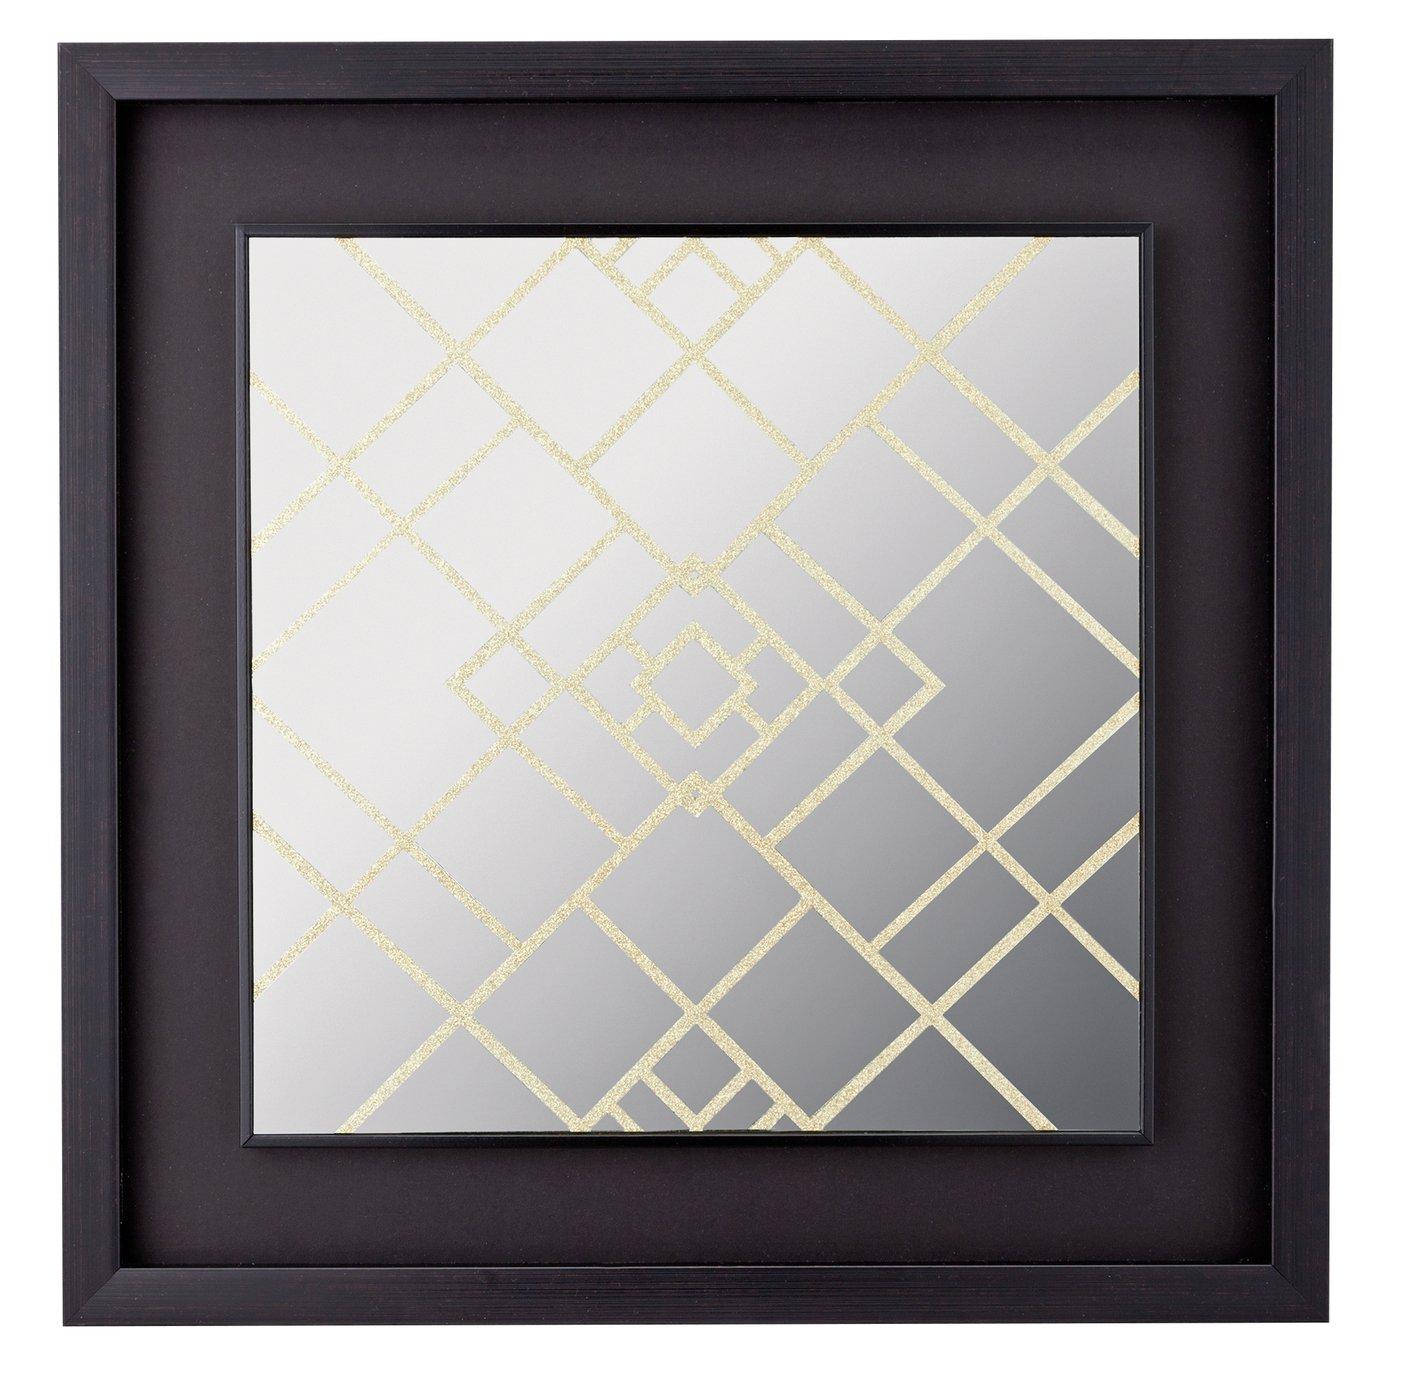 Collection Square Glitter Mirror - Grey & Gold